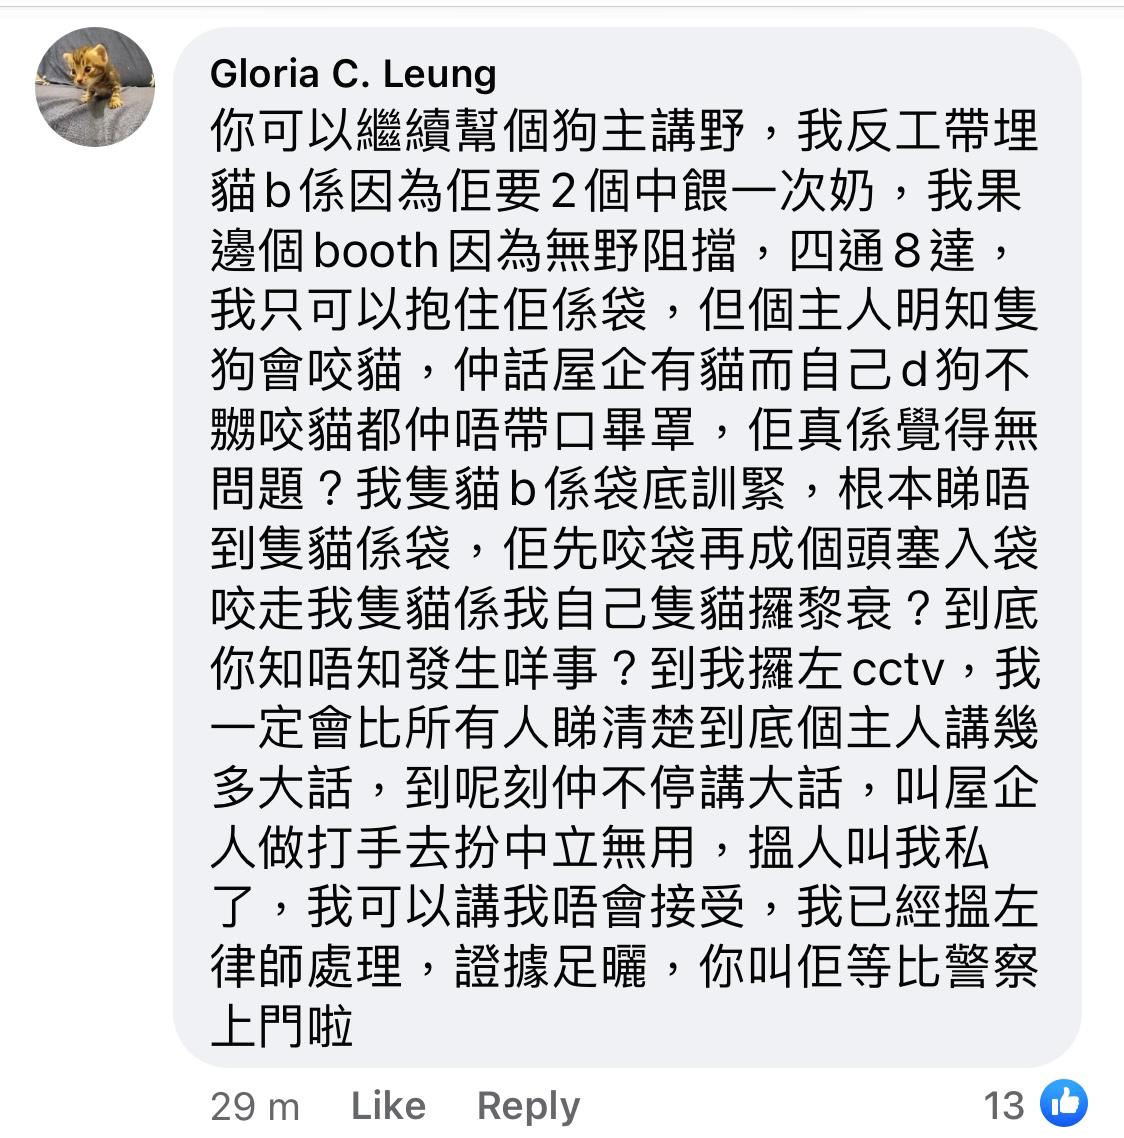 https://na.cx/i/pGVUOoh.png